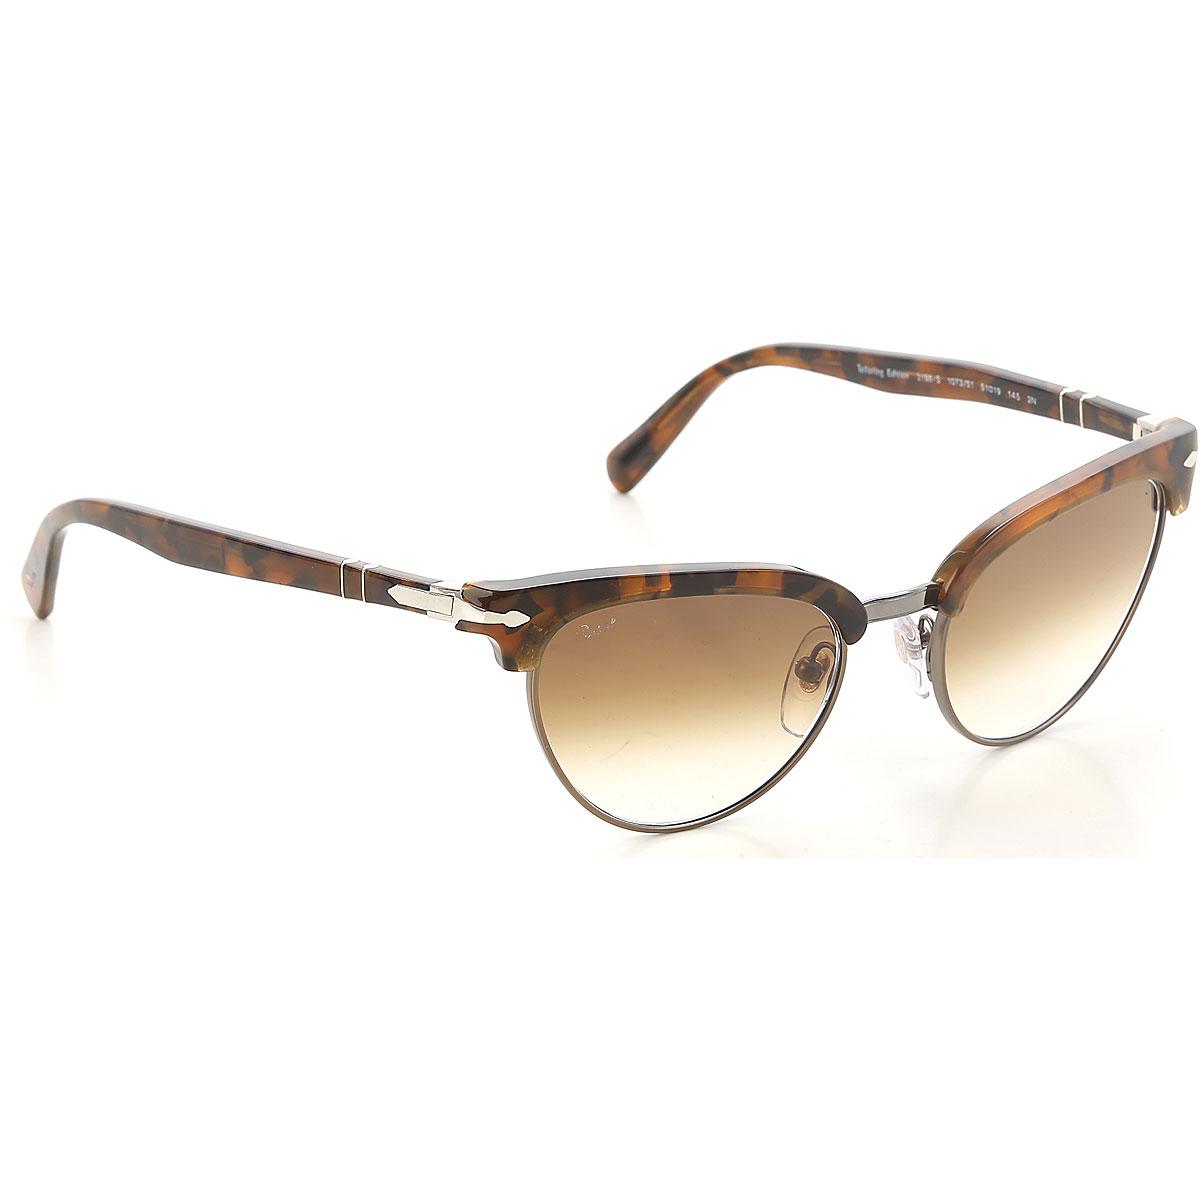 Persol Sunglasses On Sale, Dark Tortoise, 2019